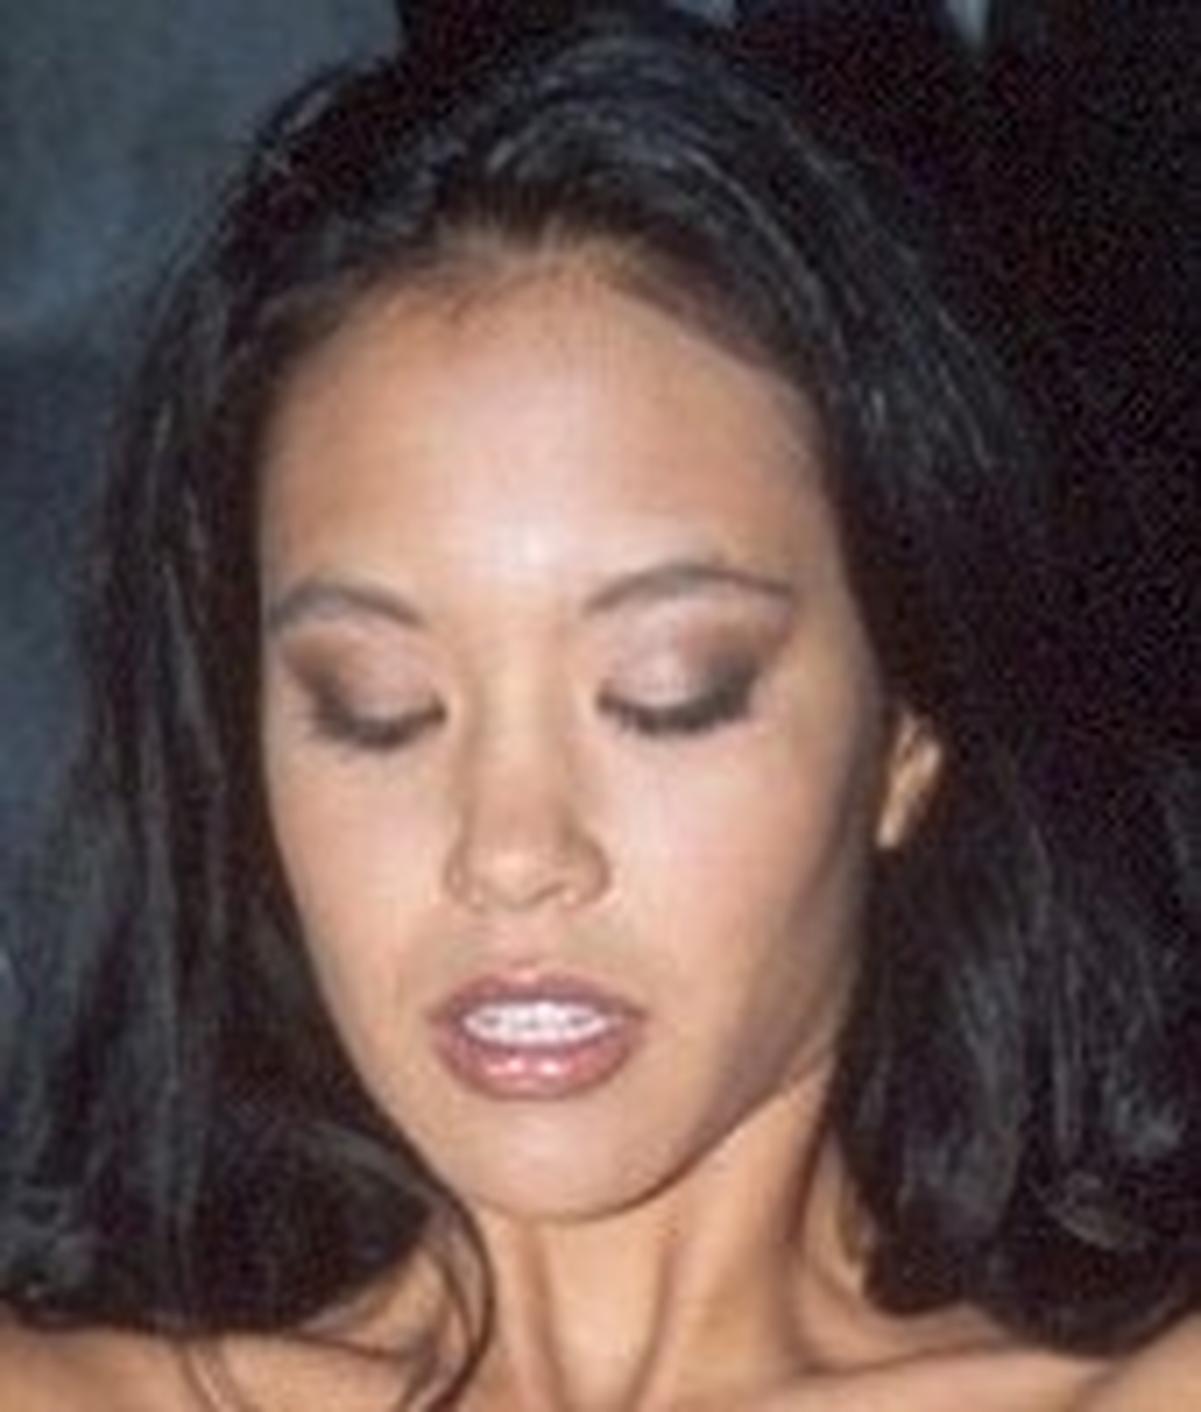 Gyselle Dahl